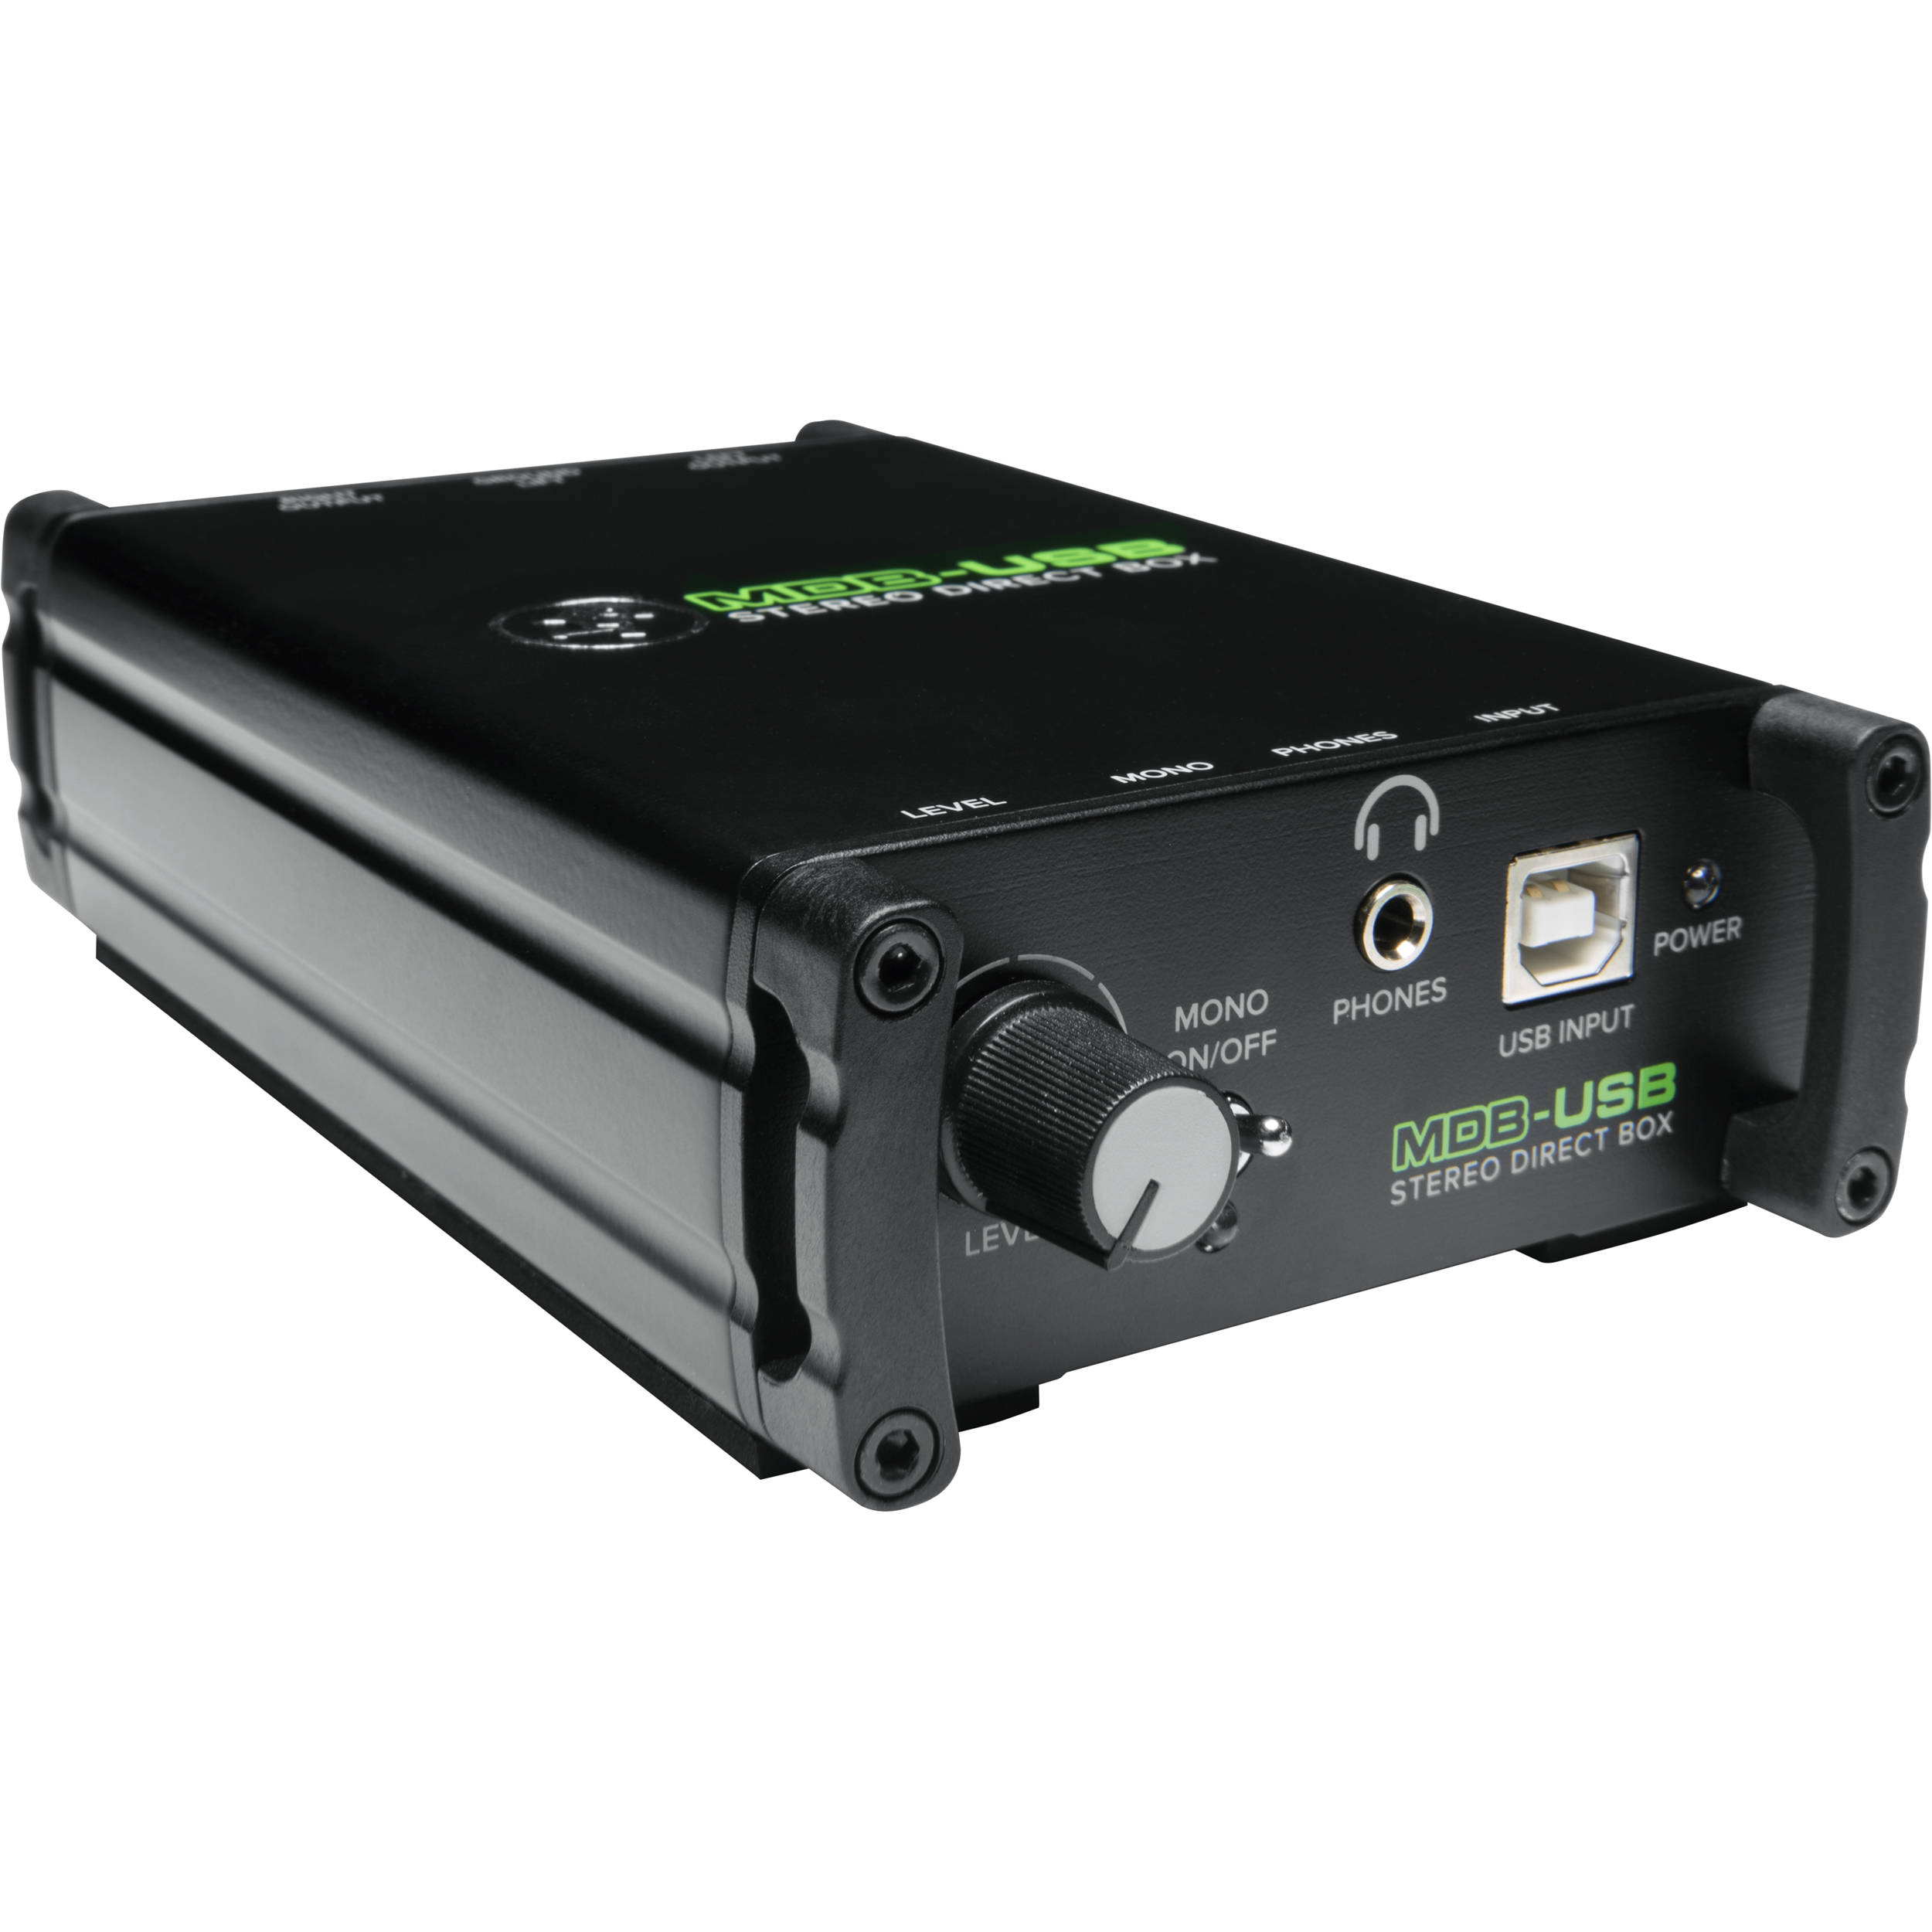 Mackie MDB-USB Stereo DAC Direct Box